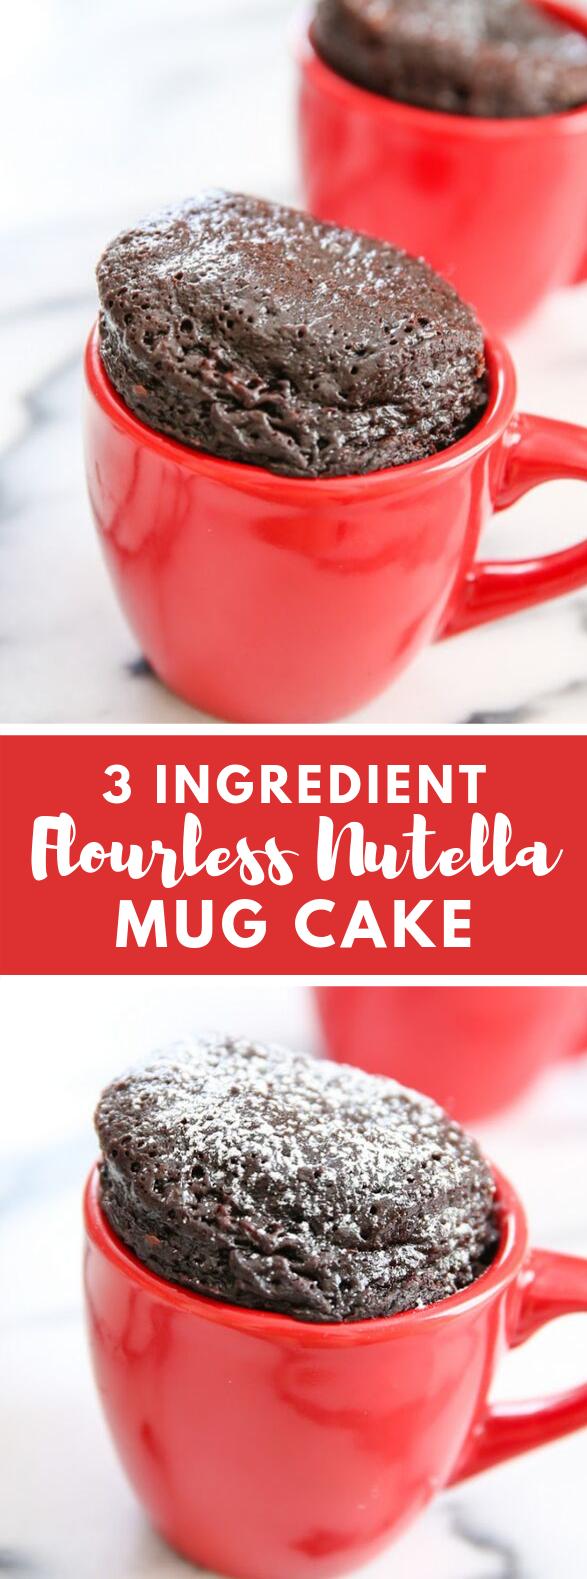 3 INGREDIENT FLOURLESS NUTELLA MUG CAKE #desserts #chocolate